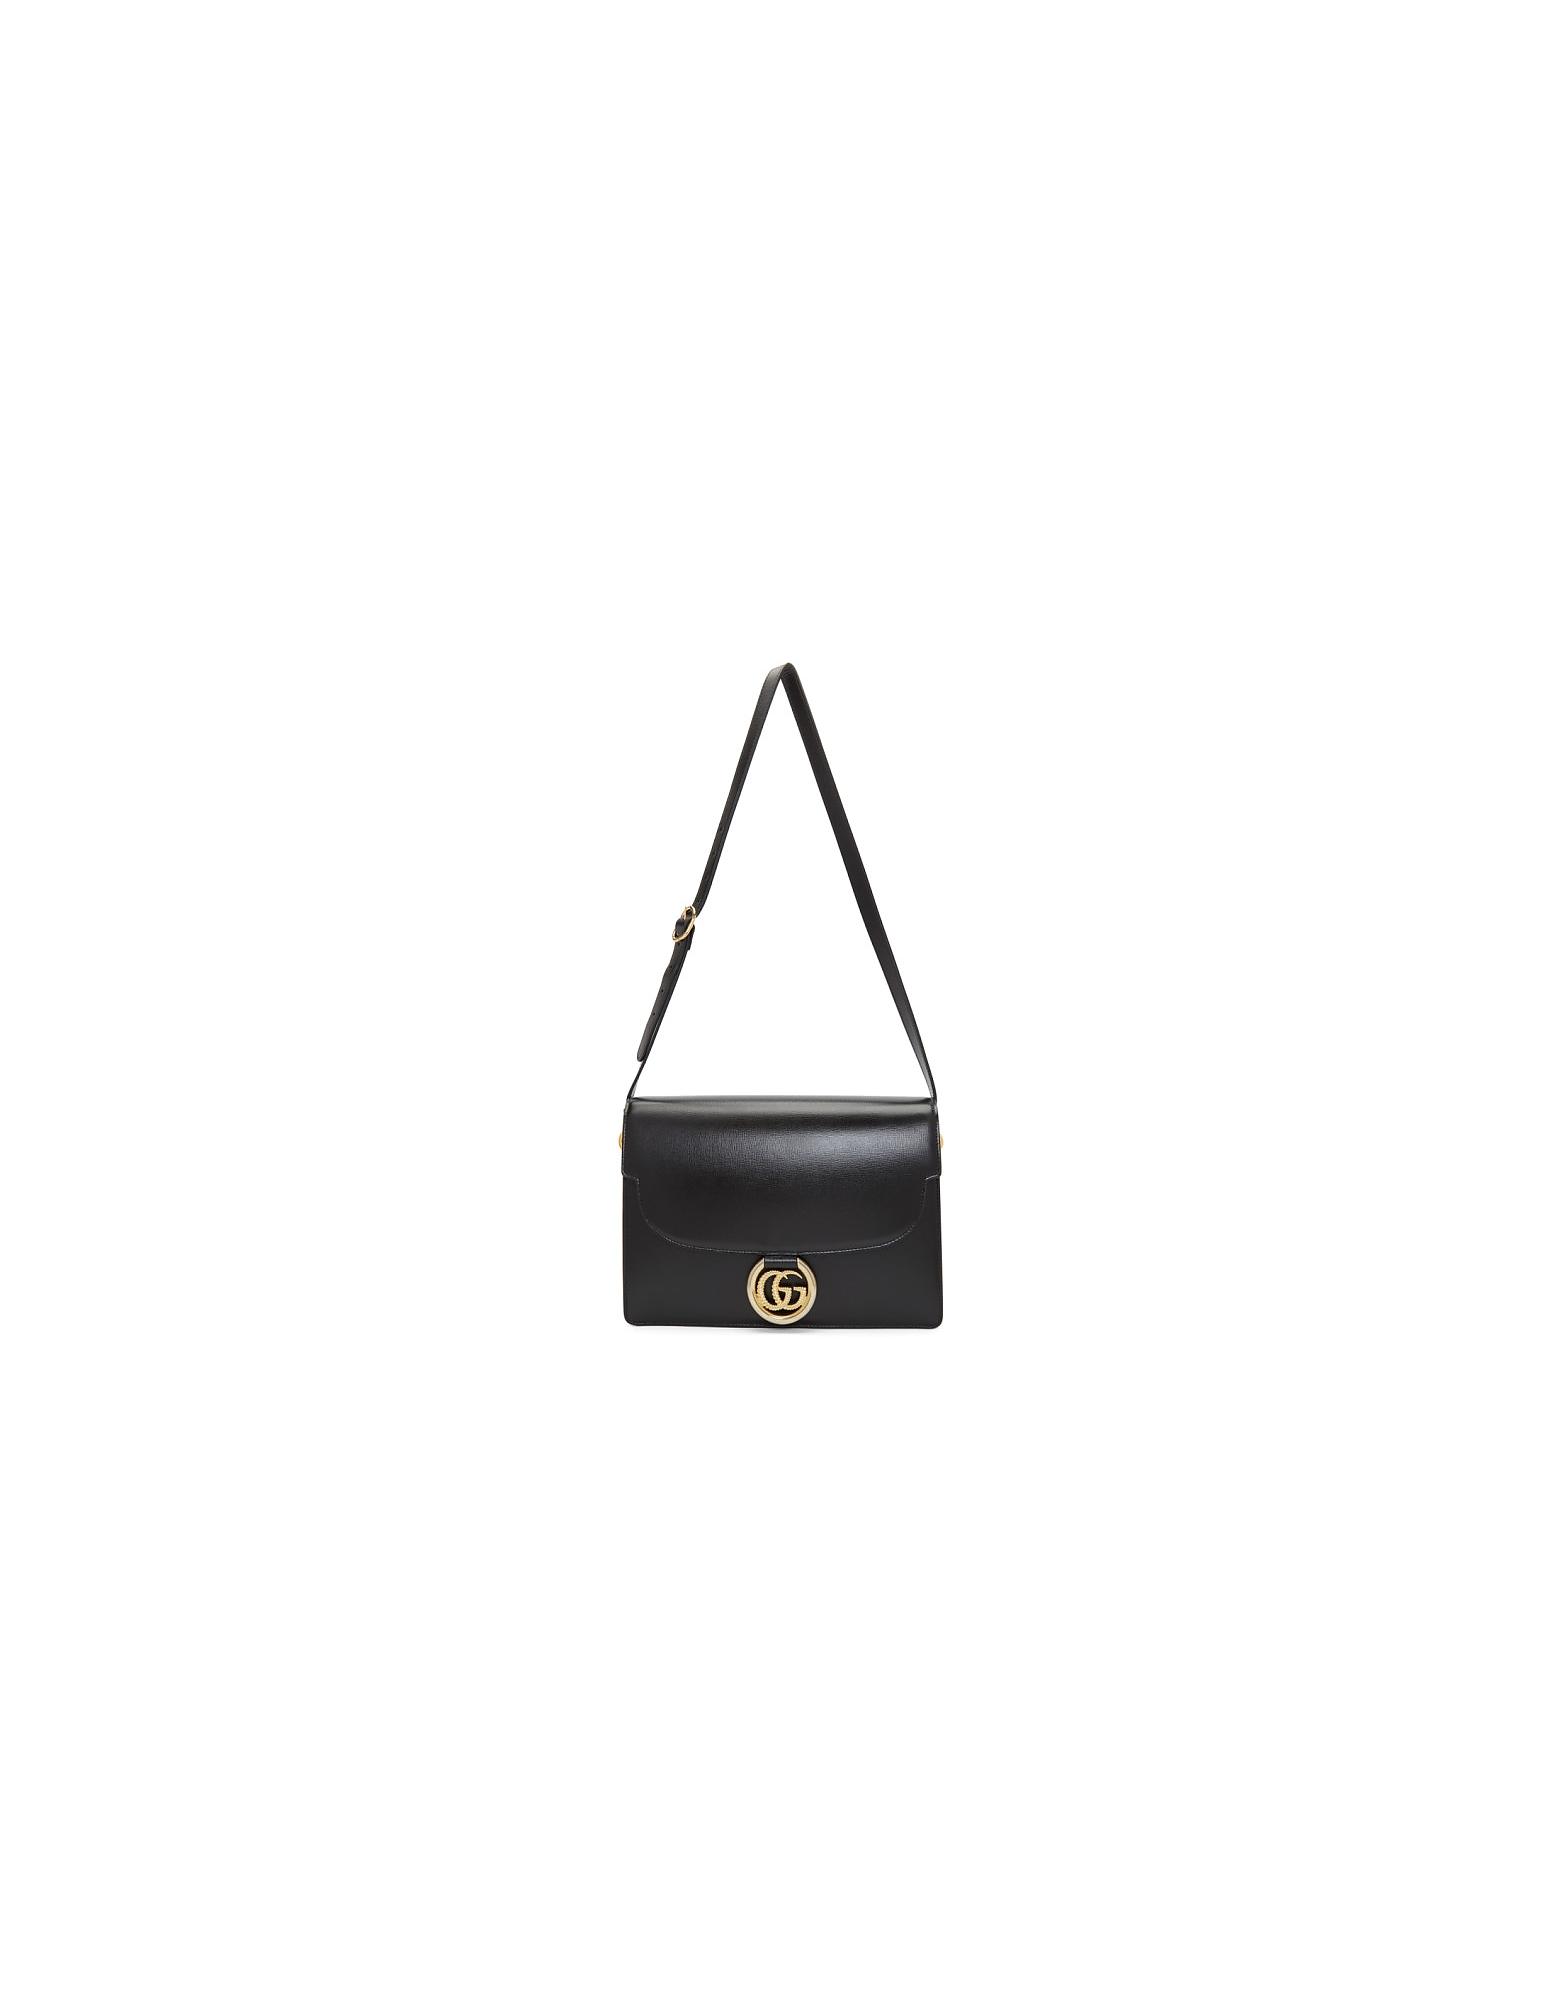 Gucci Designer Handbags, Black GG Ring Bag